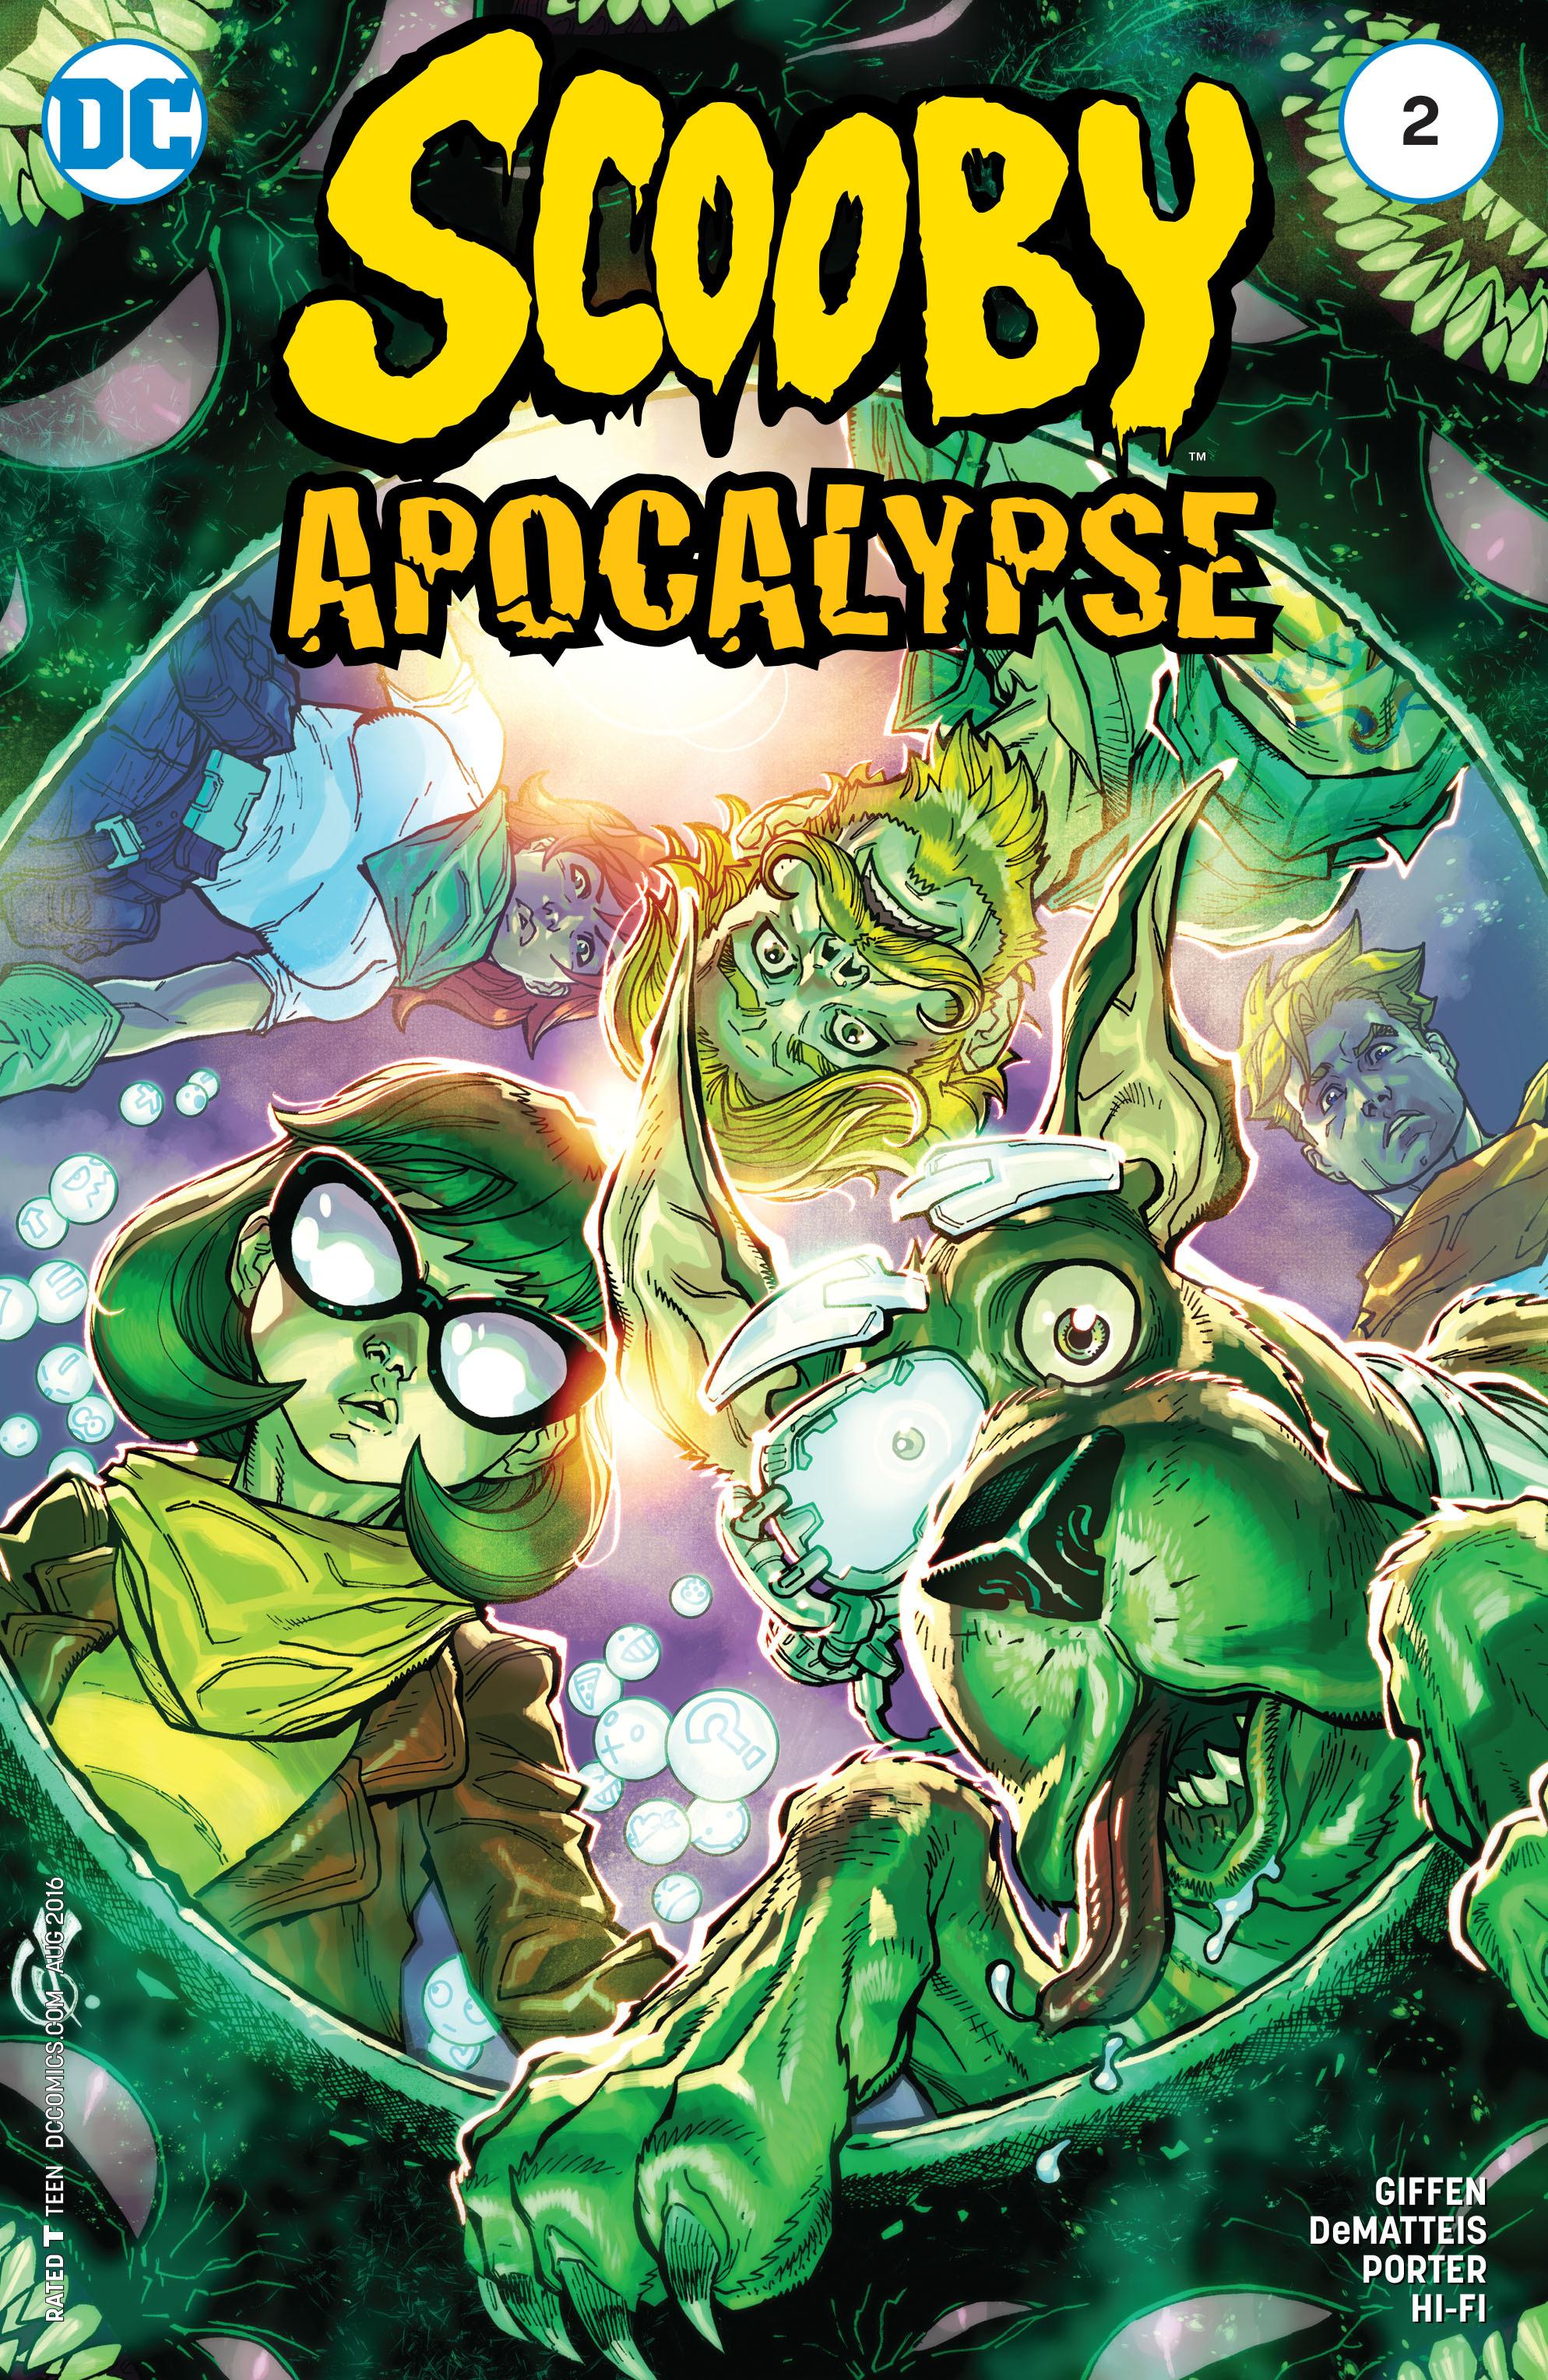 Read online Scooby Apocalypse comic -  Issue #2 - 3